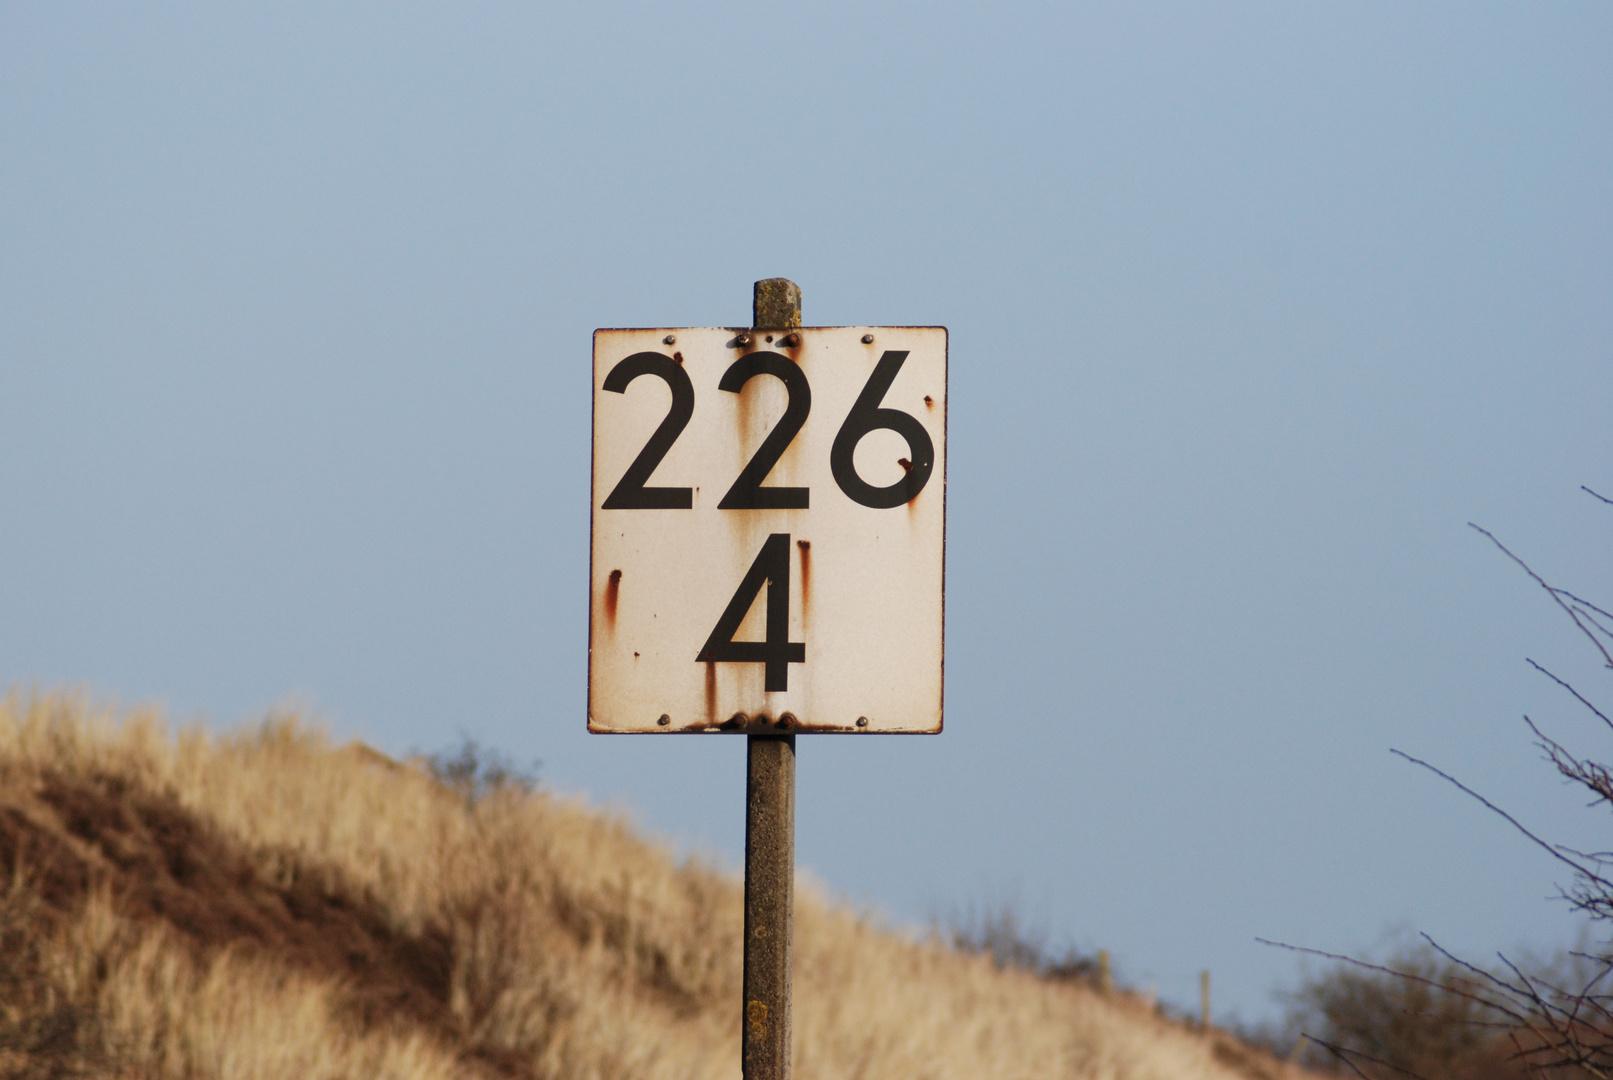 Kilometer 226 / 4